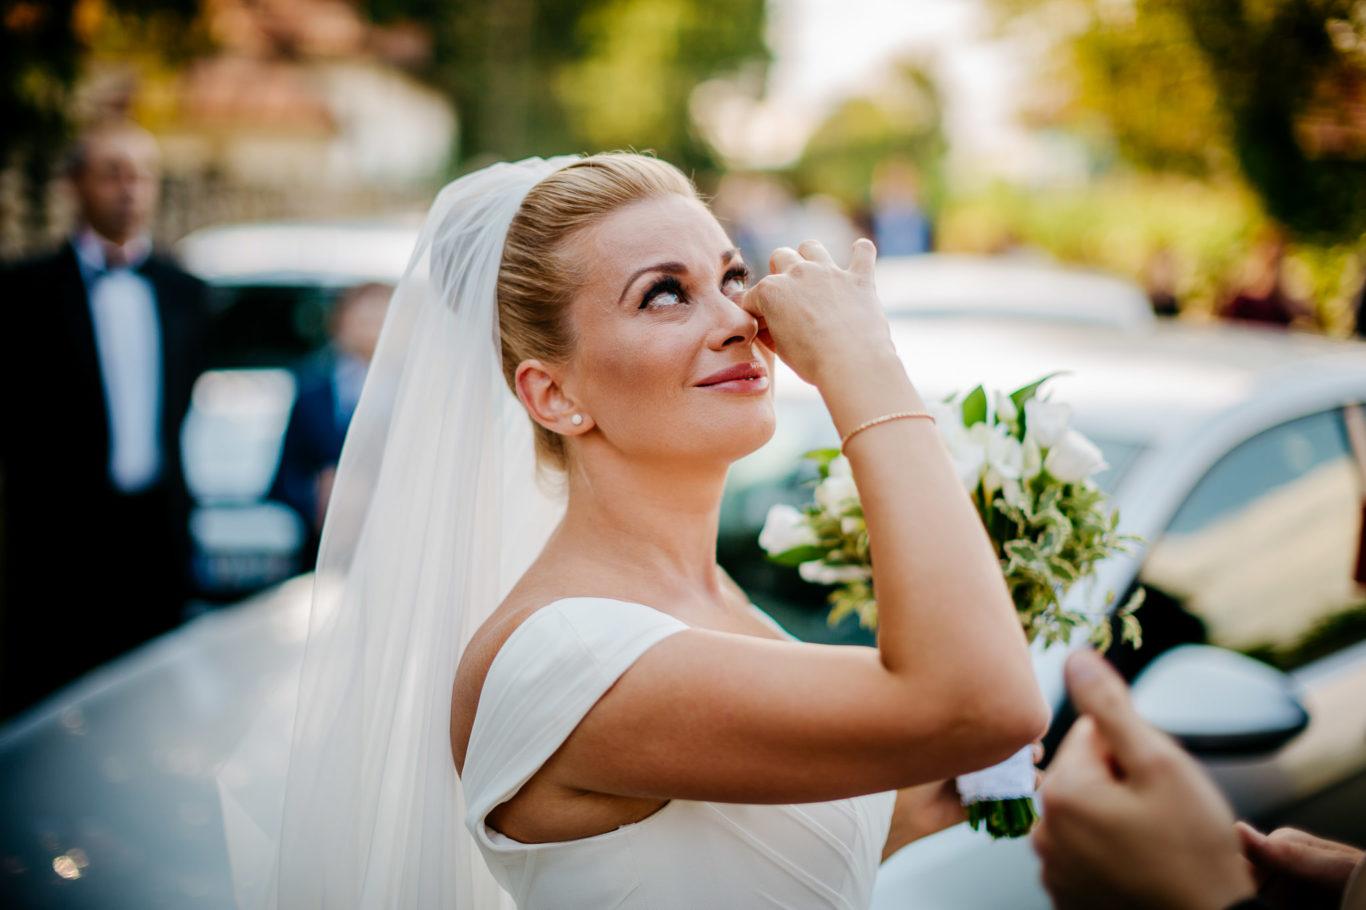 0231-fotoreportaj-nunta-conacul-maldar-cristina-stefan-fotograf-ciprian-dumitrescu-cd2_2960